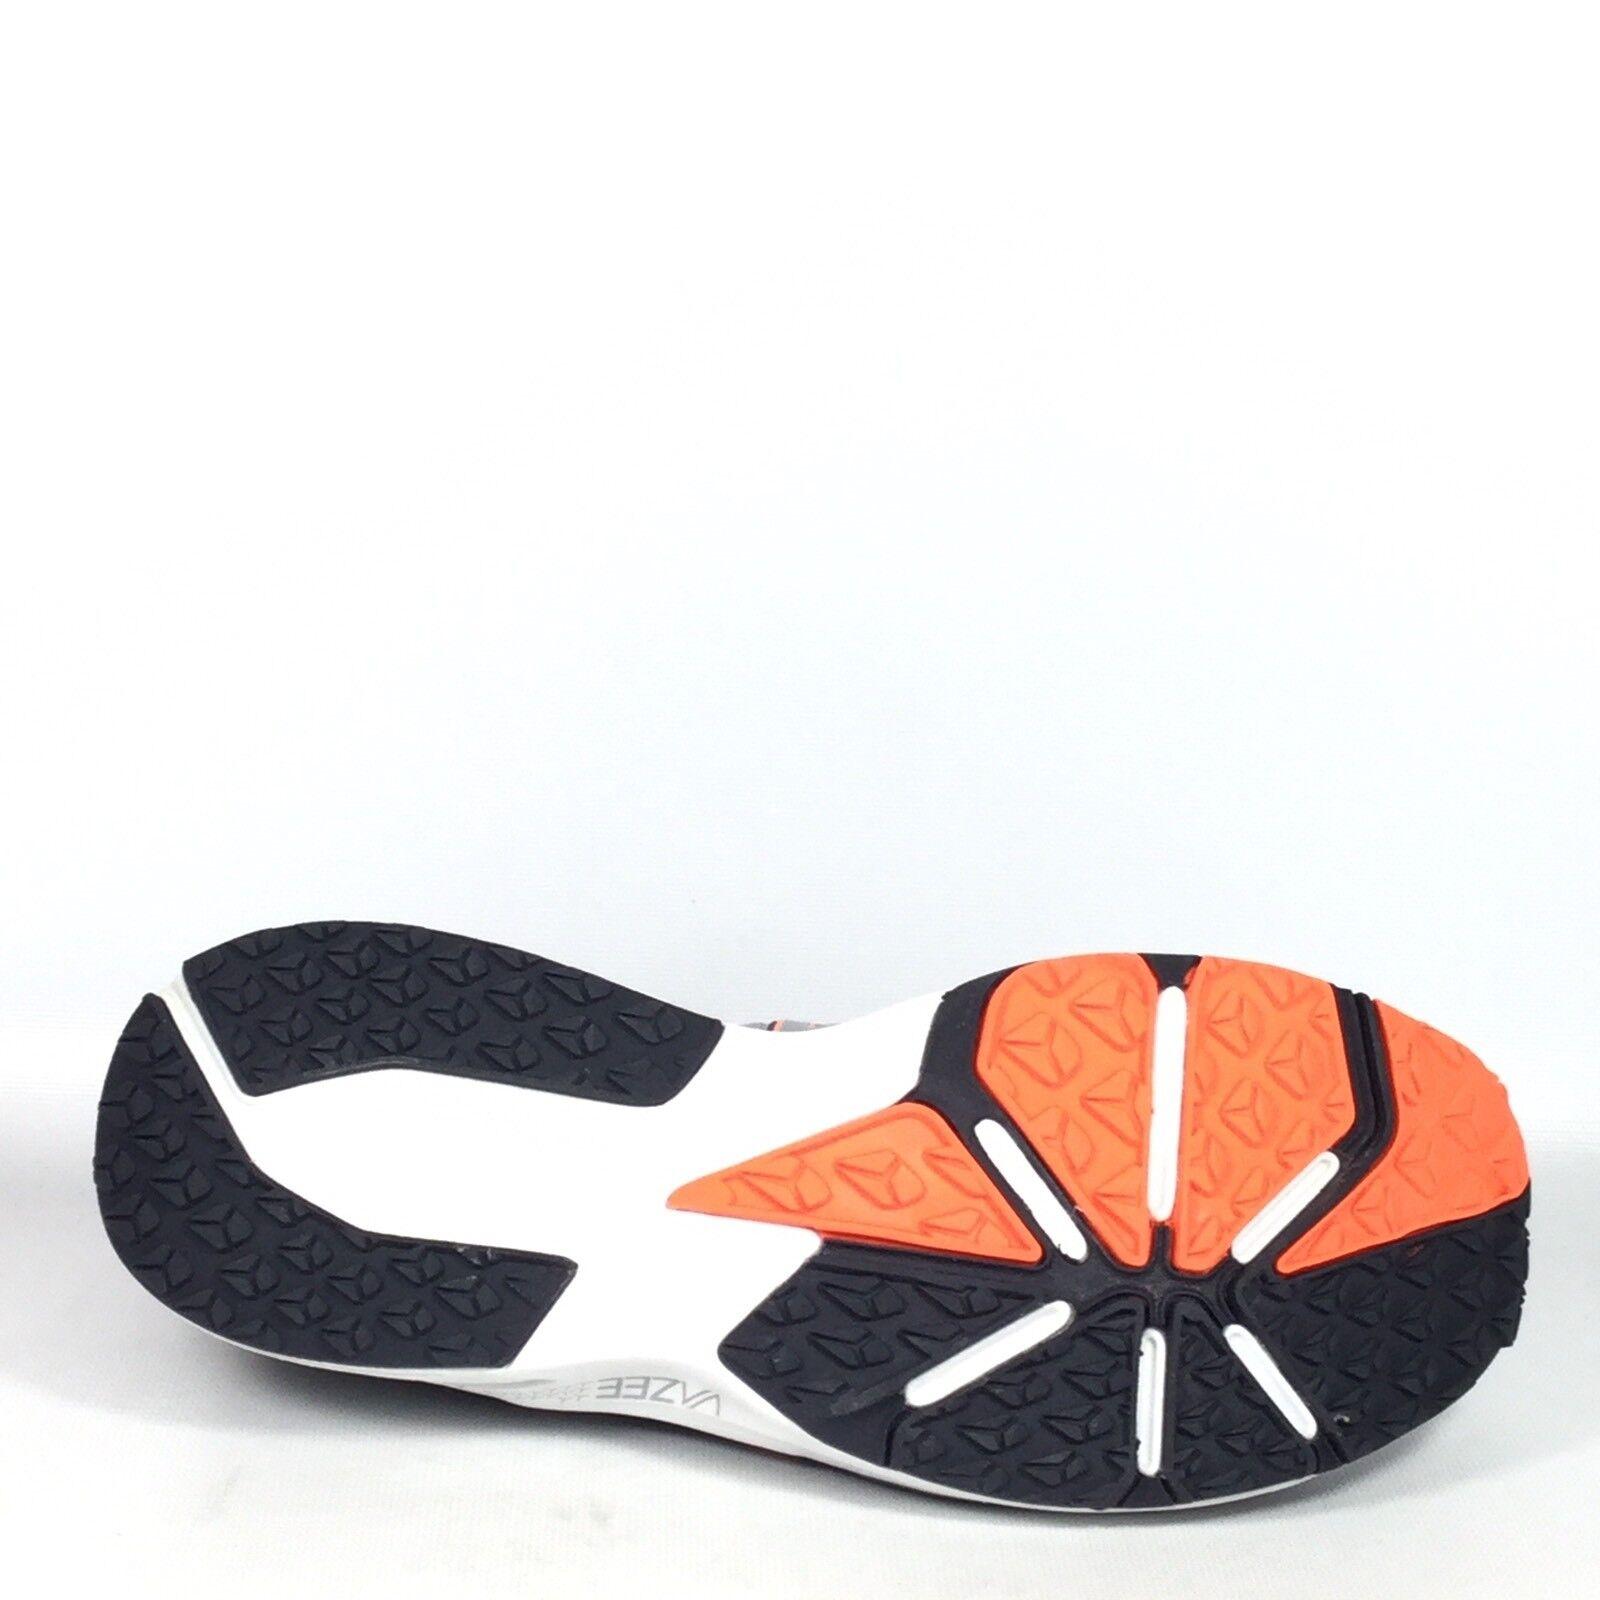 New New New balance mxqikgo mens größe 8,5 d navy / orange kanton passen ausbildung turnschuhe. 3a1bce